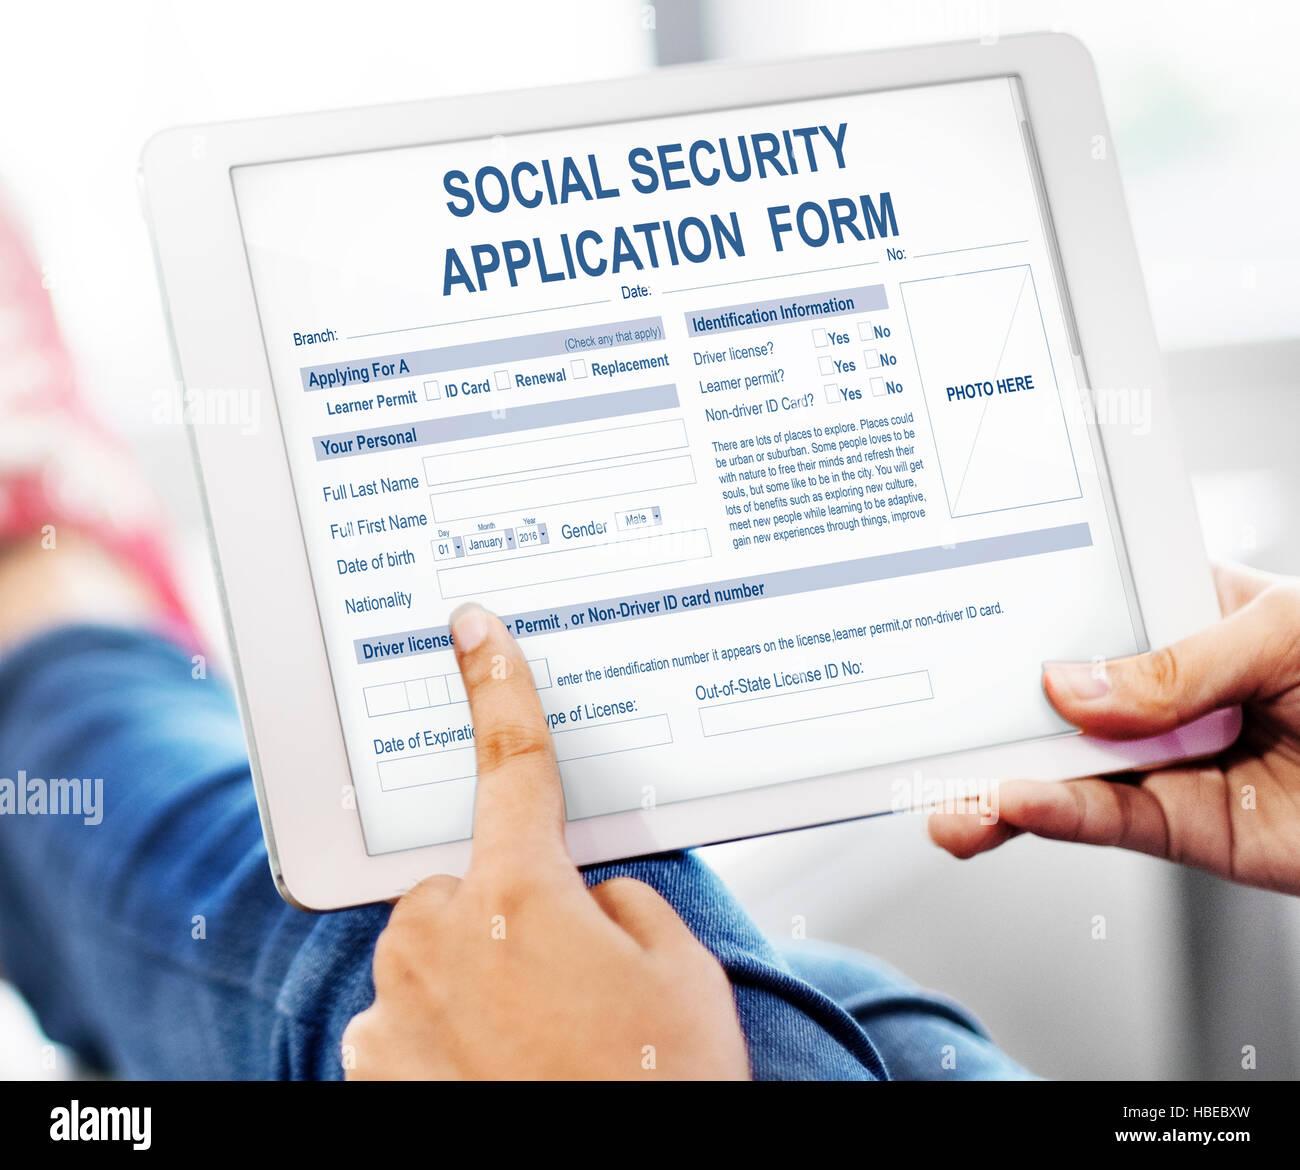 Social Security Application Form Concept Photo Royalty Free – Social Security Application Form